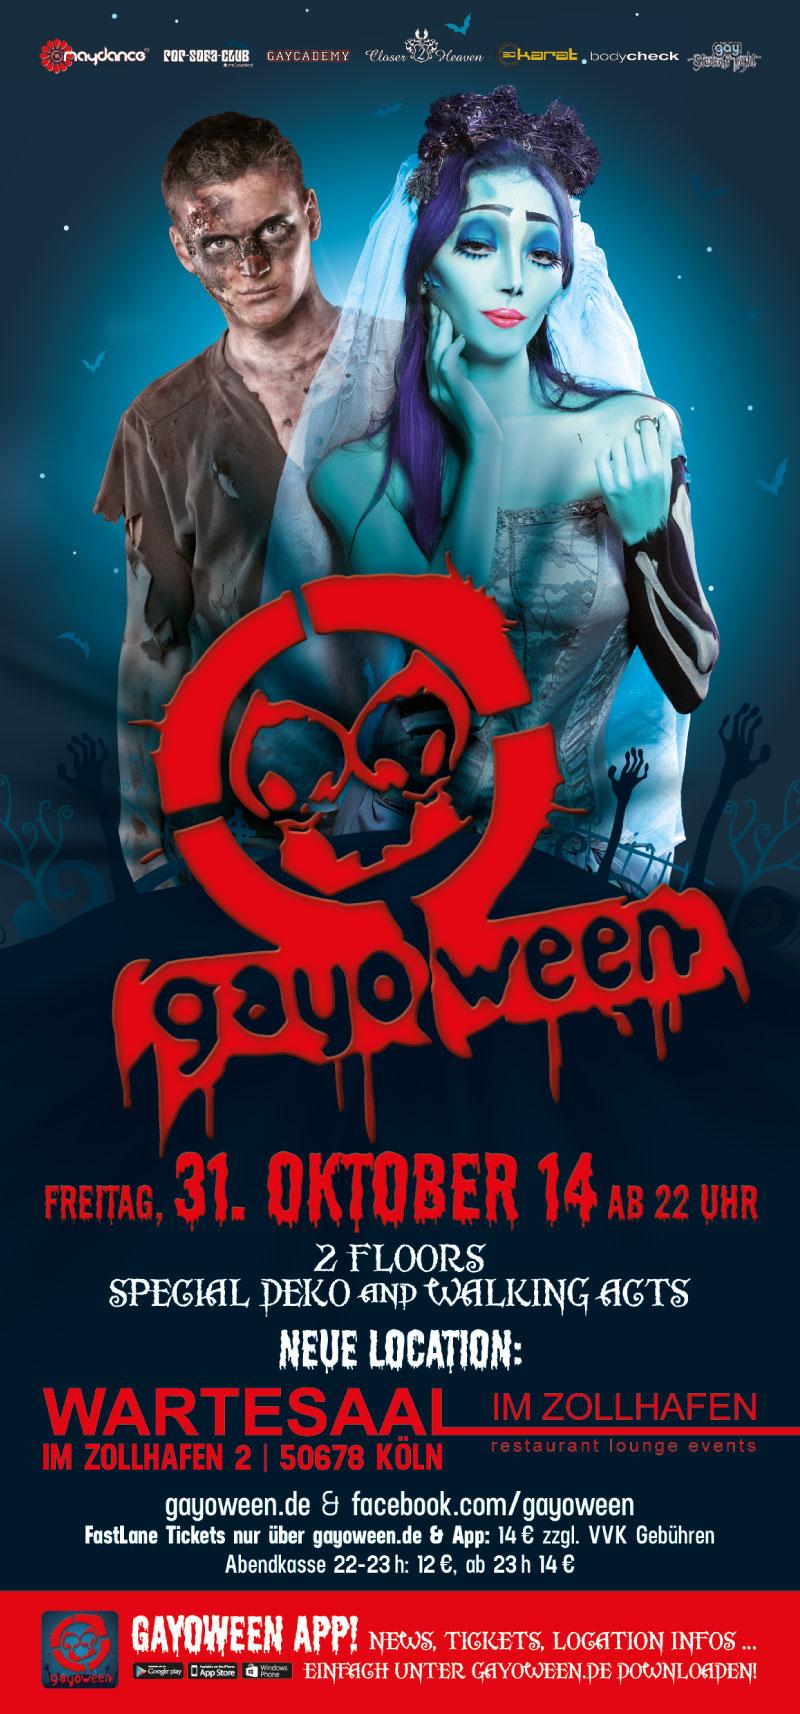 GAYOWEEN 2014 Flyer vorne